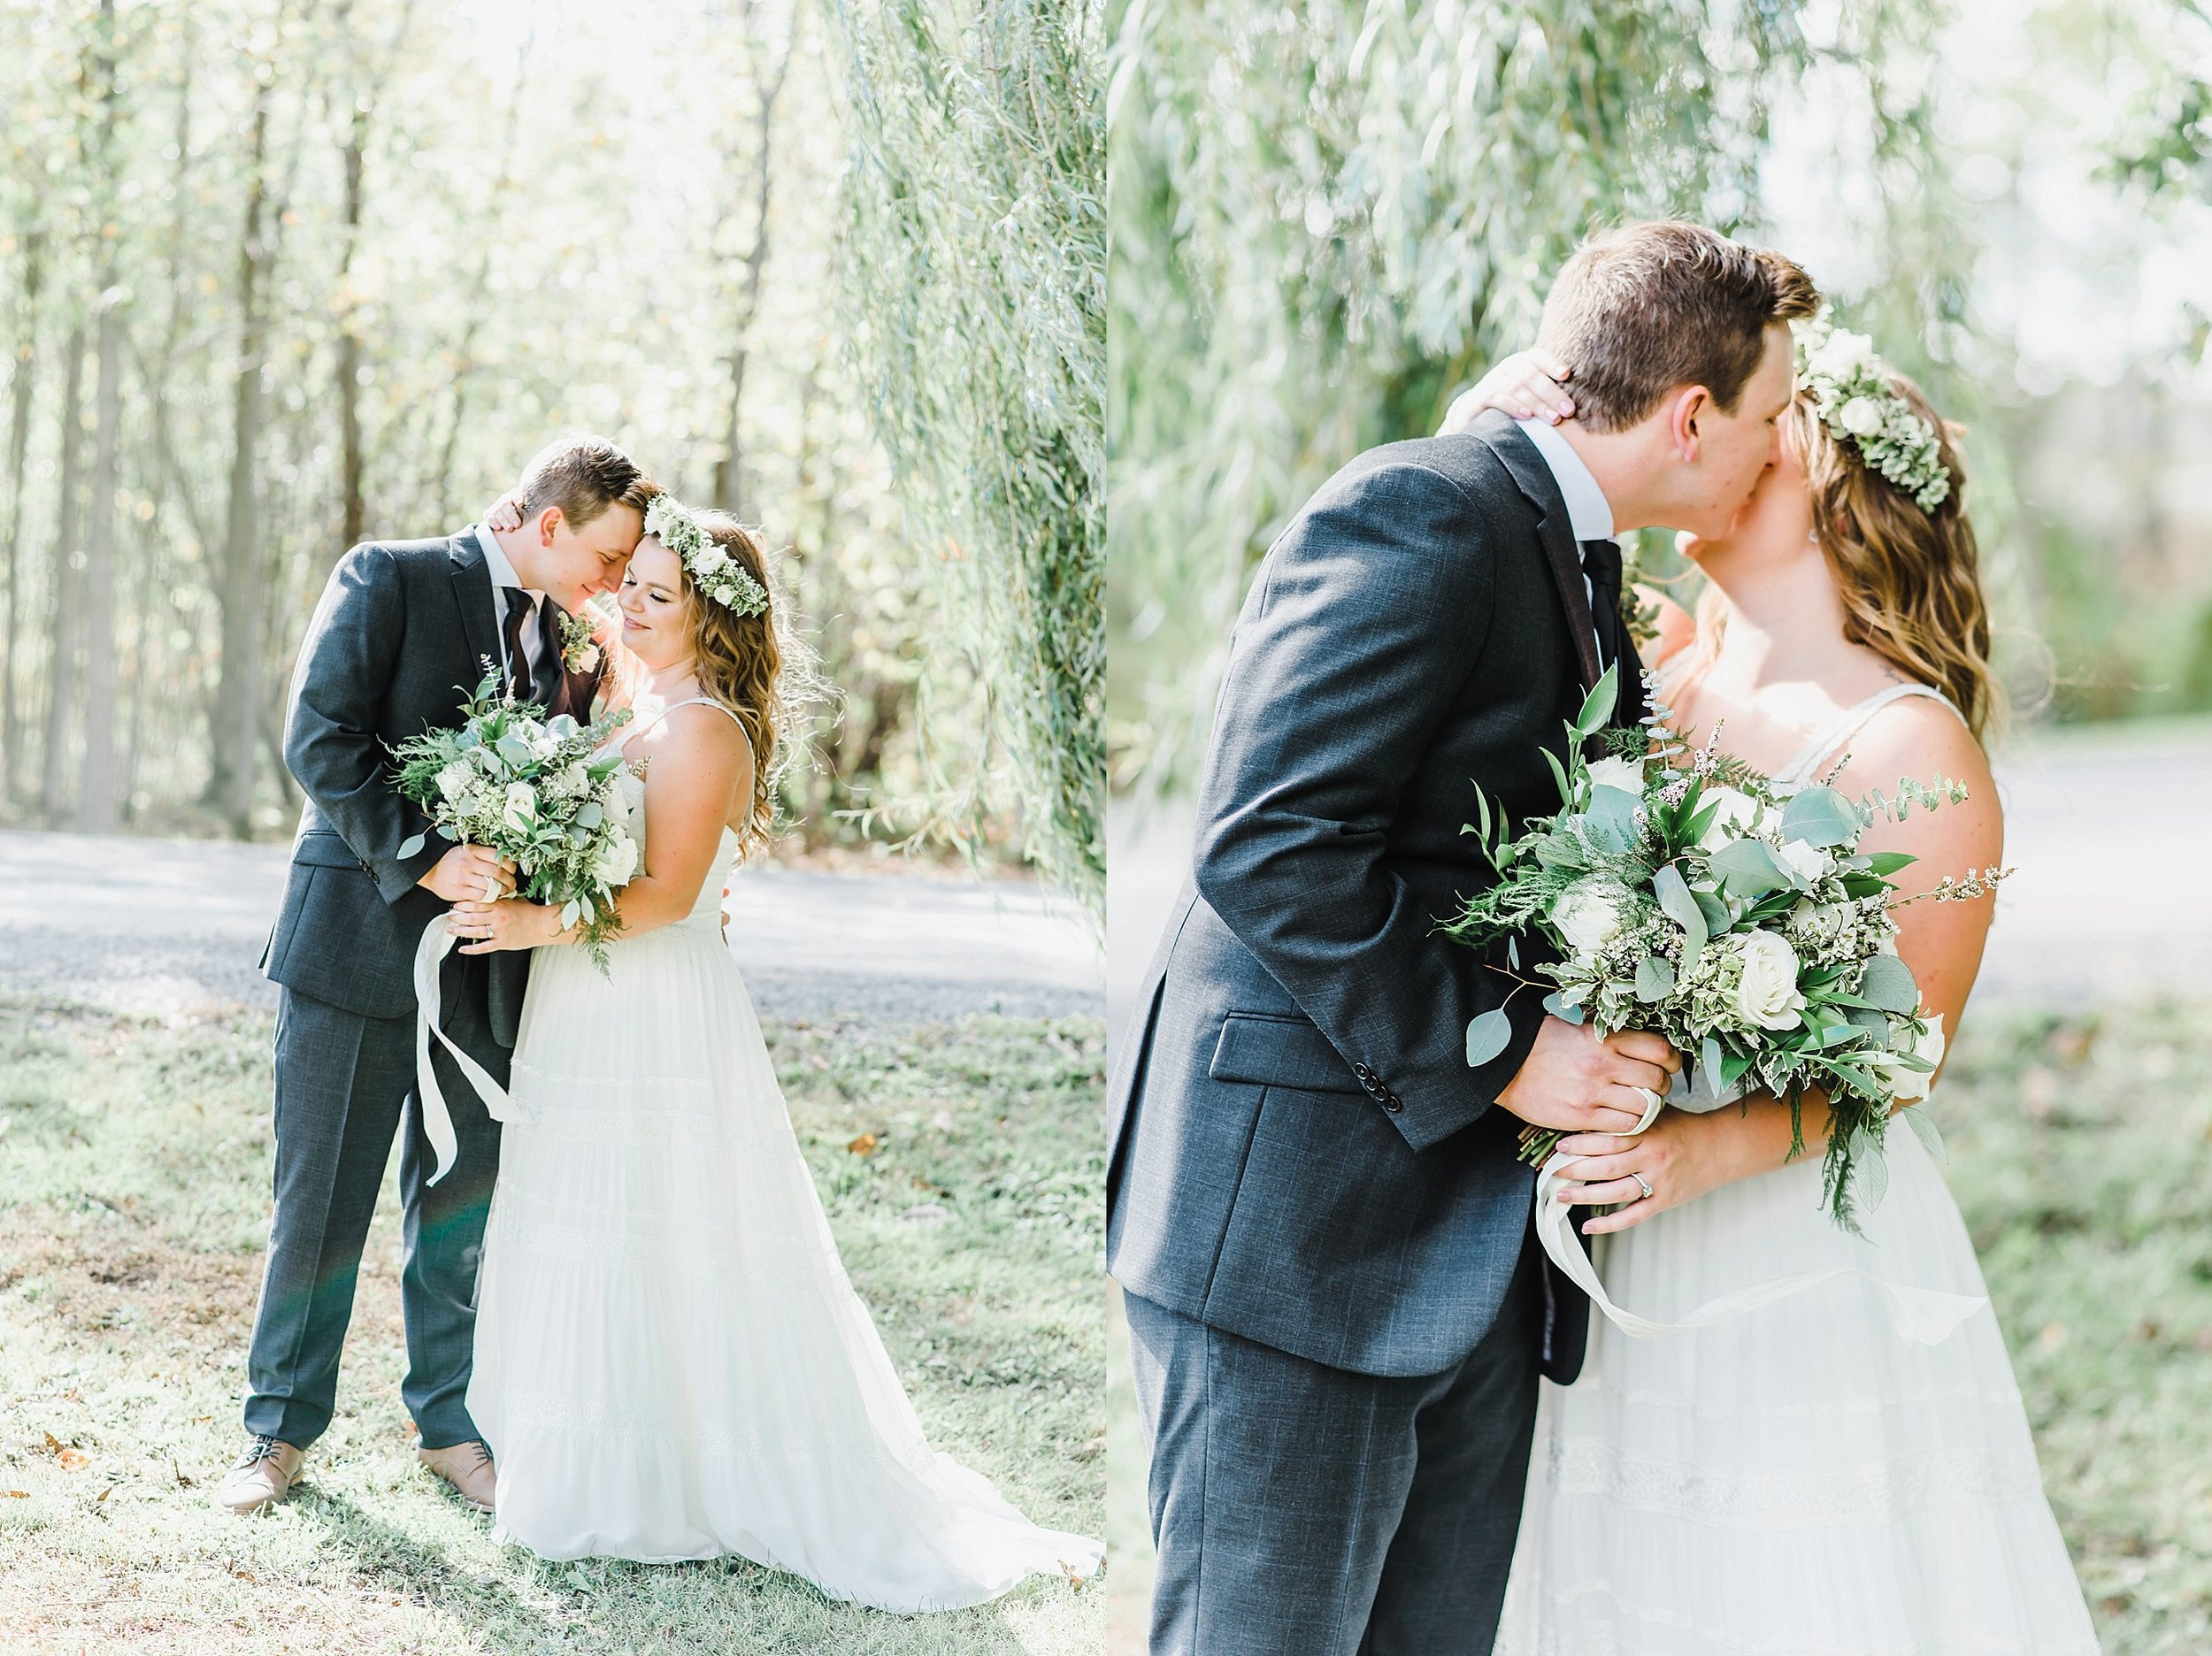 light airy indie fine art ottawa wedding photographer | Ali and Batoul Photography_1107.jpg